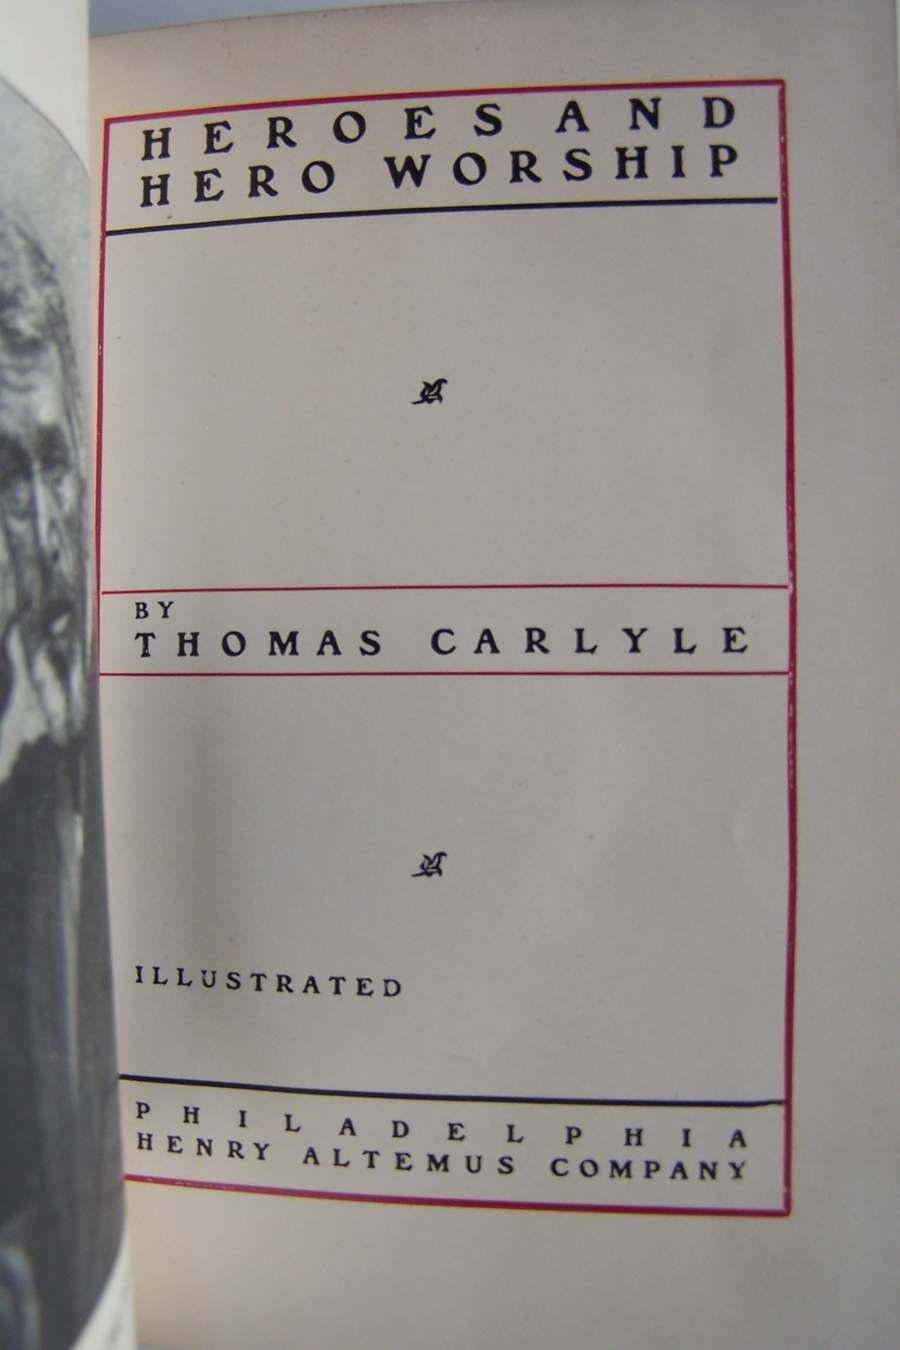 Heroes and Hero Worship Thomas Carlyle